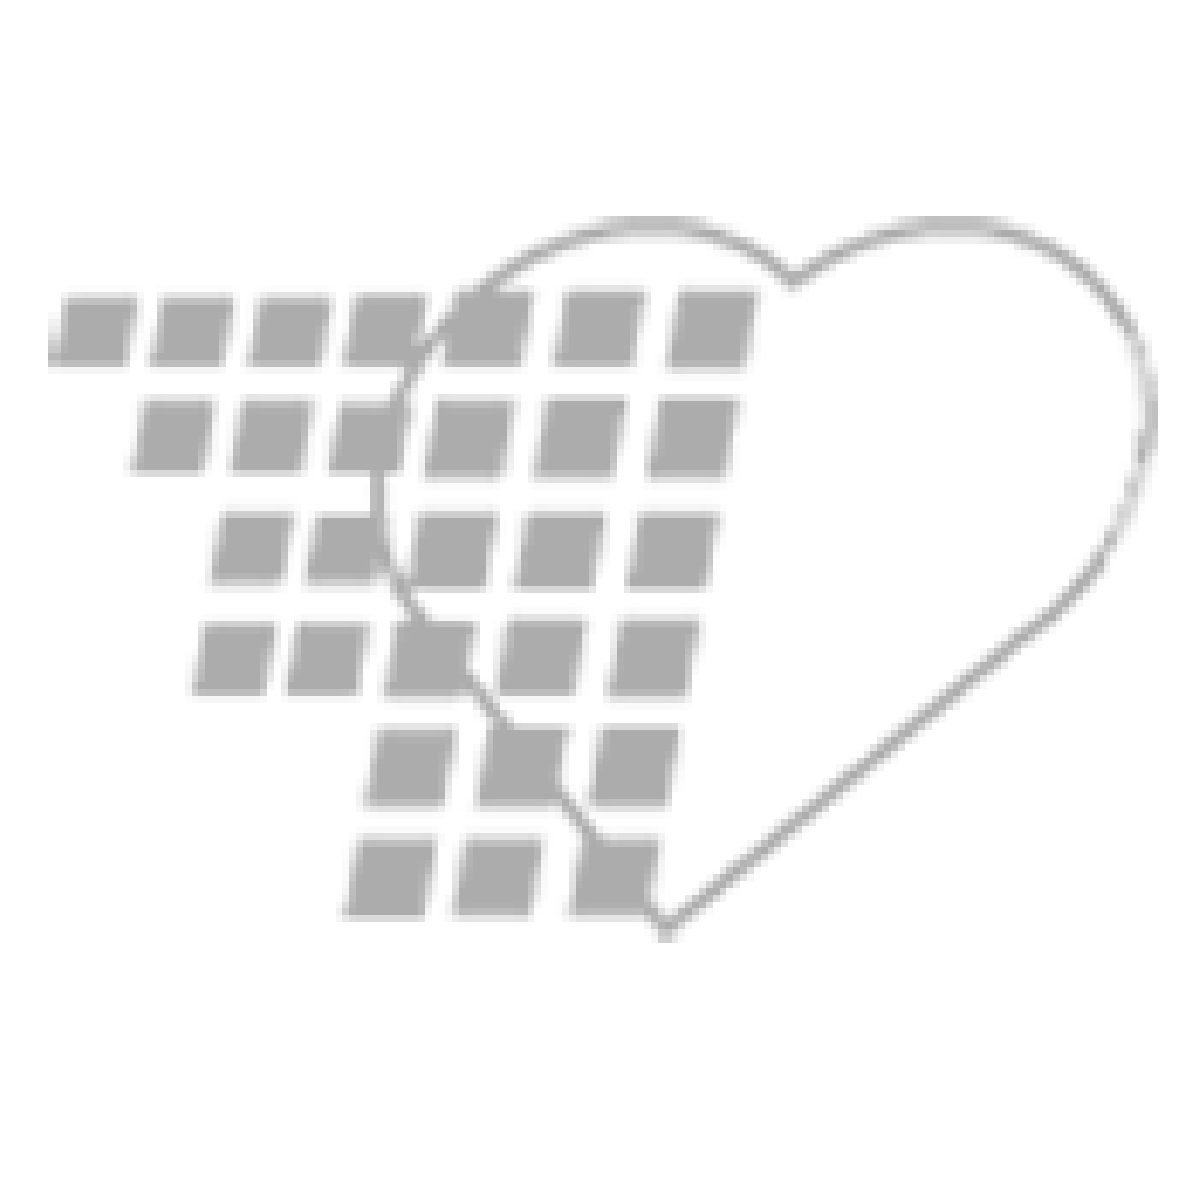 03-47-1141-SM - Innovative Healthcare Corporation NitriDerm® EC Sterile Pairs - Small